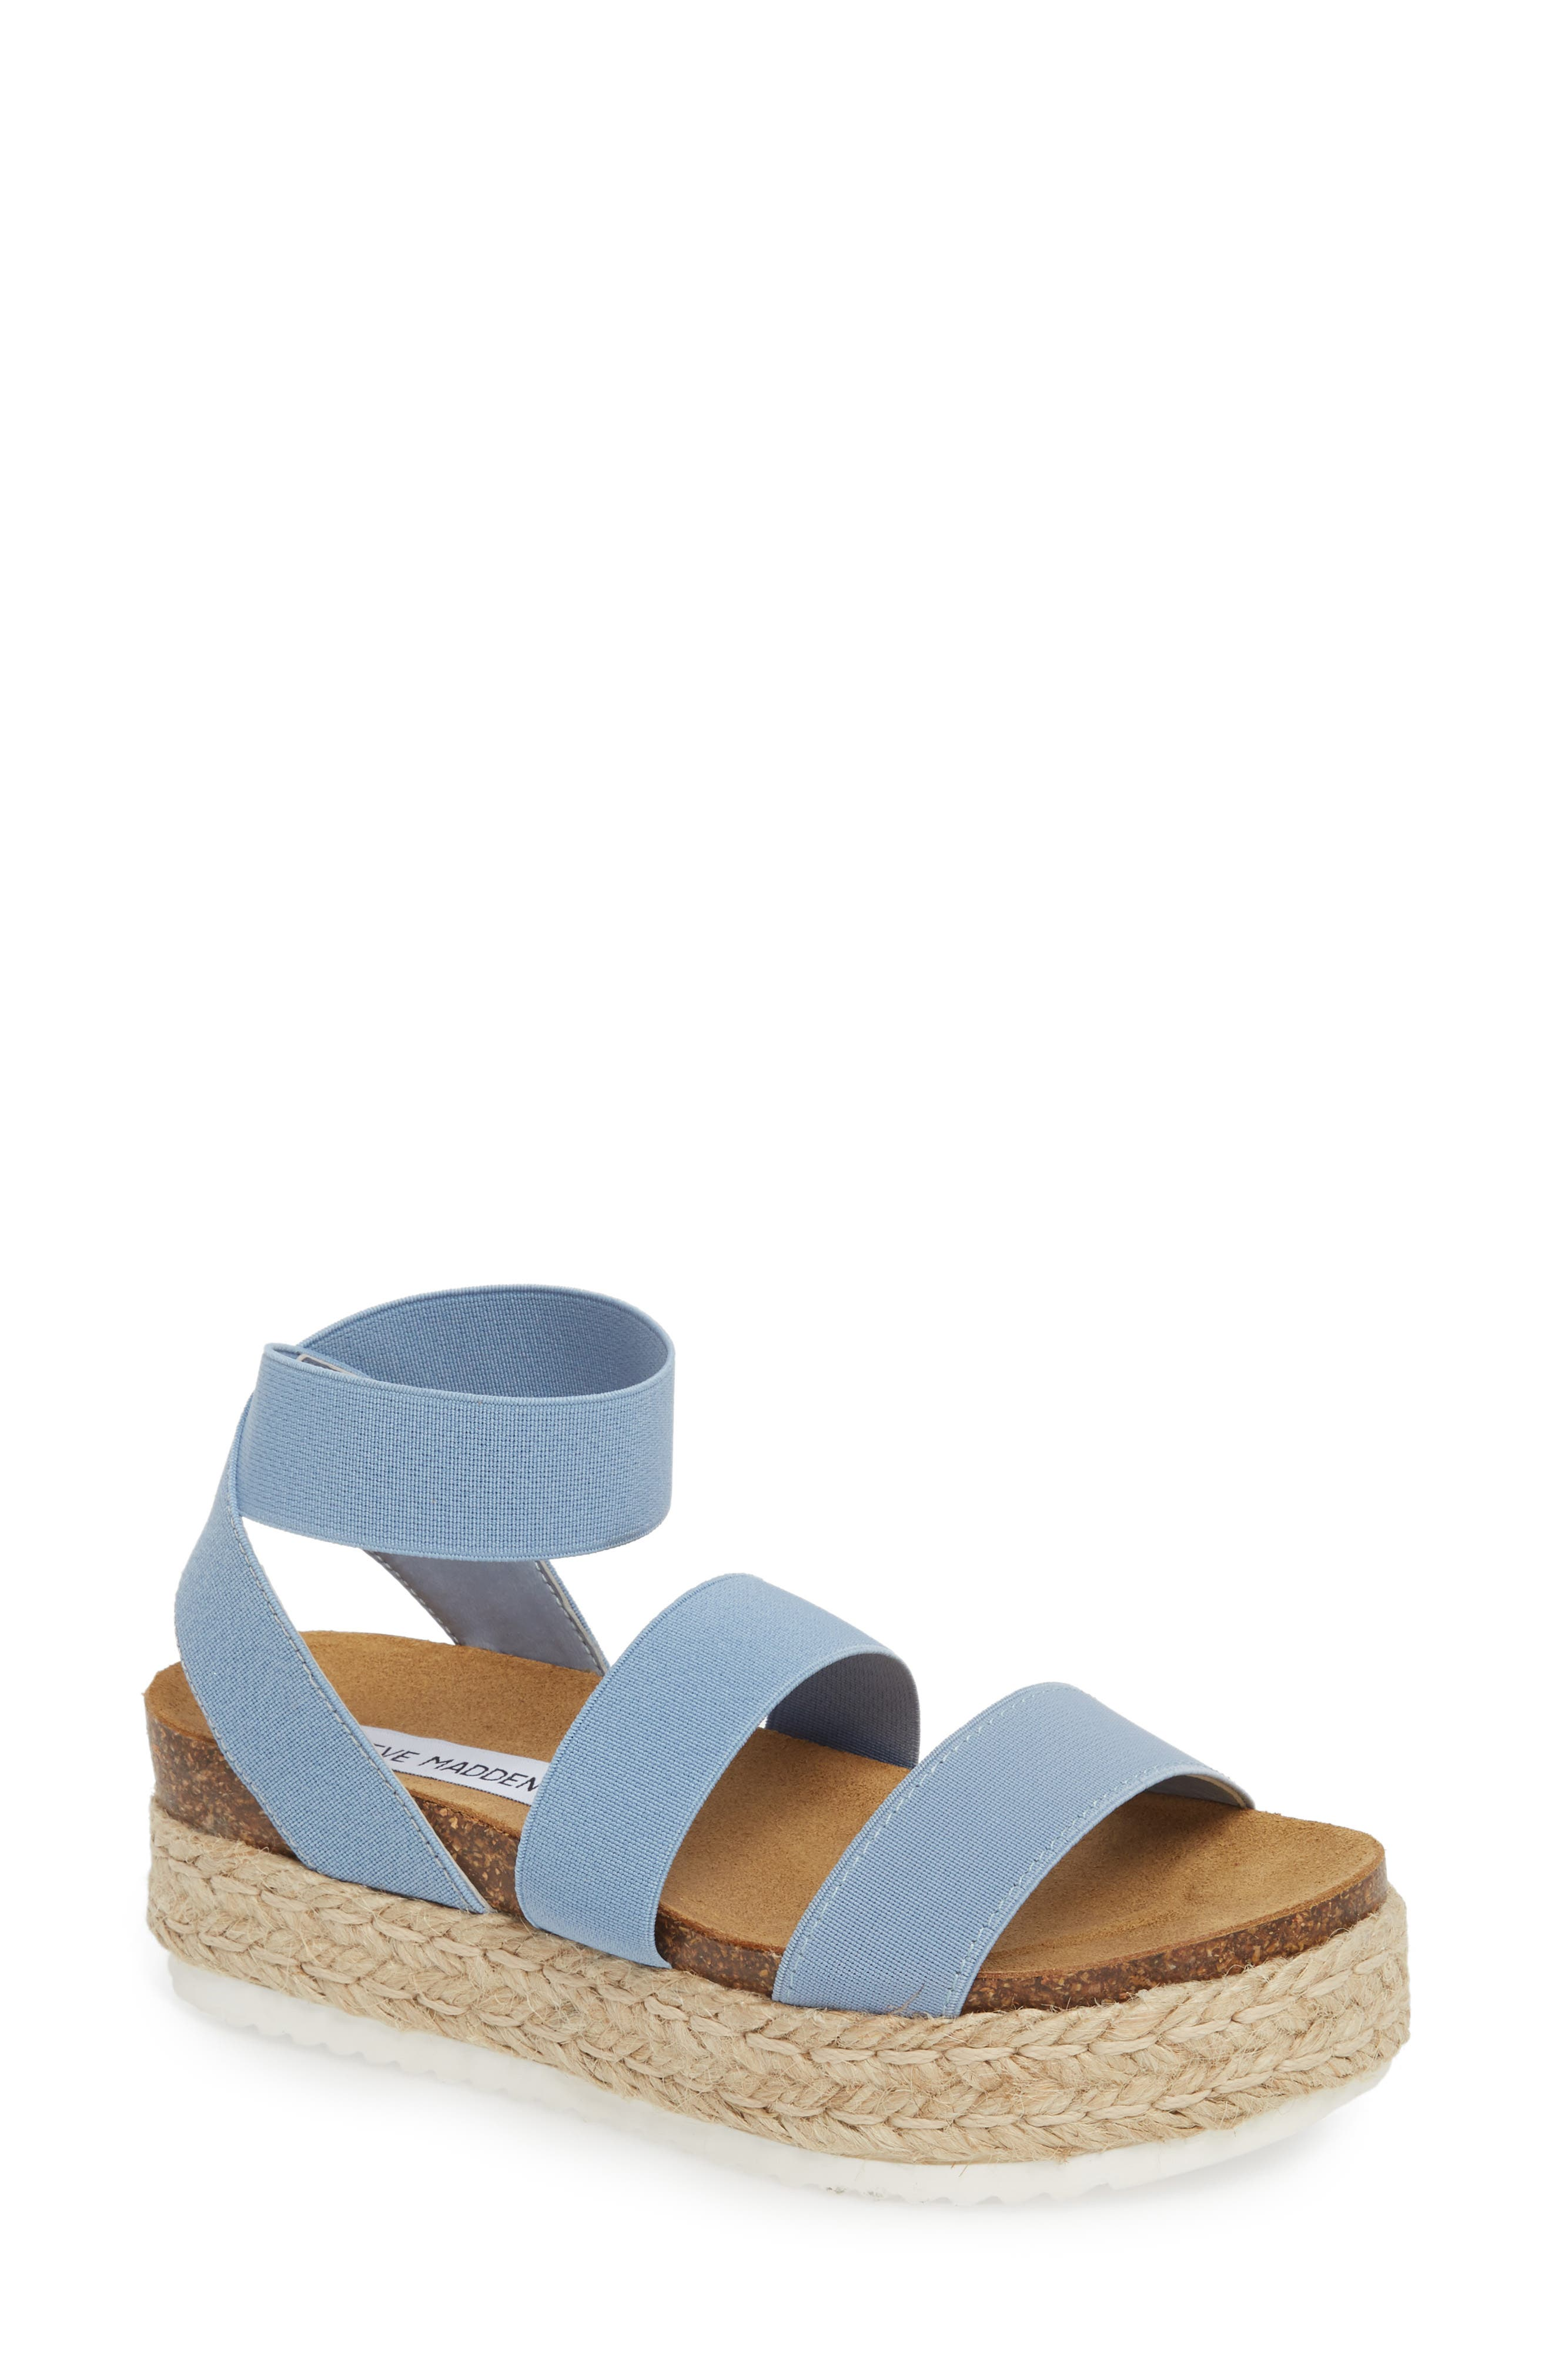 Kimmie Flatform Sandal,                             Main thumbnail 2, color,